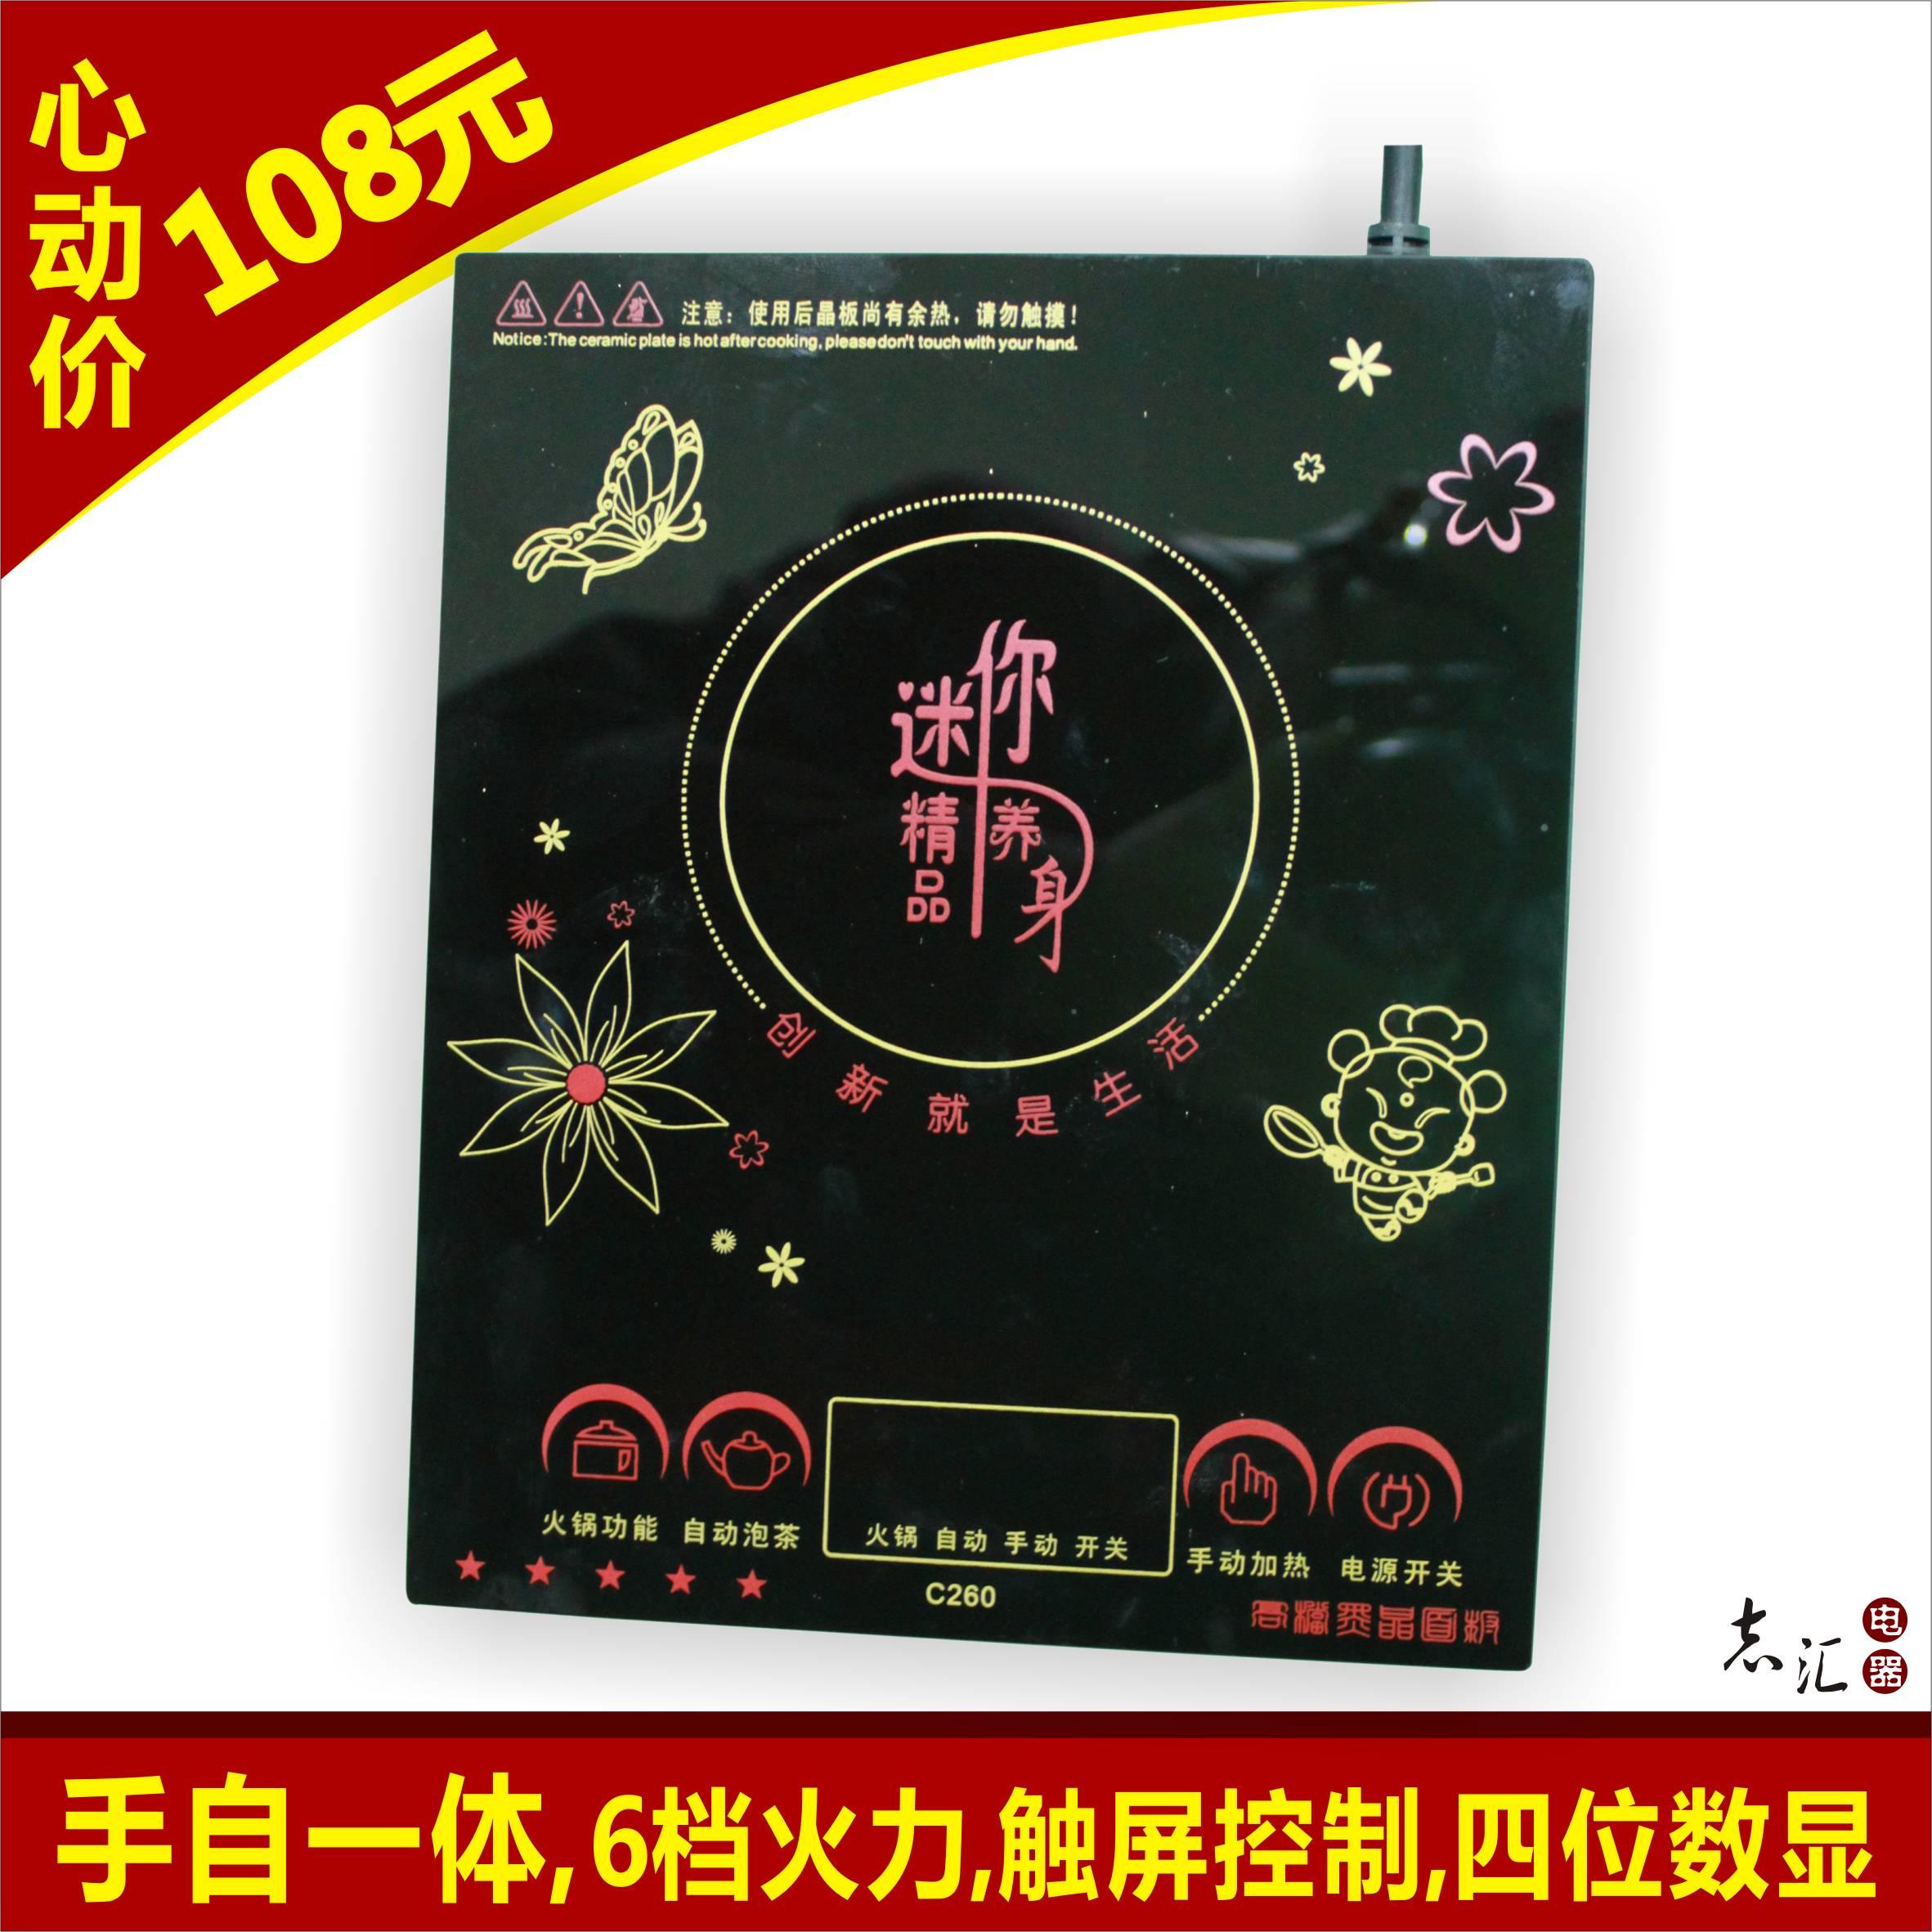 C260 mini cooker podjarka furnace tea kung fu small electromagnetic - QJ Small Domestic Appliances store